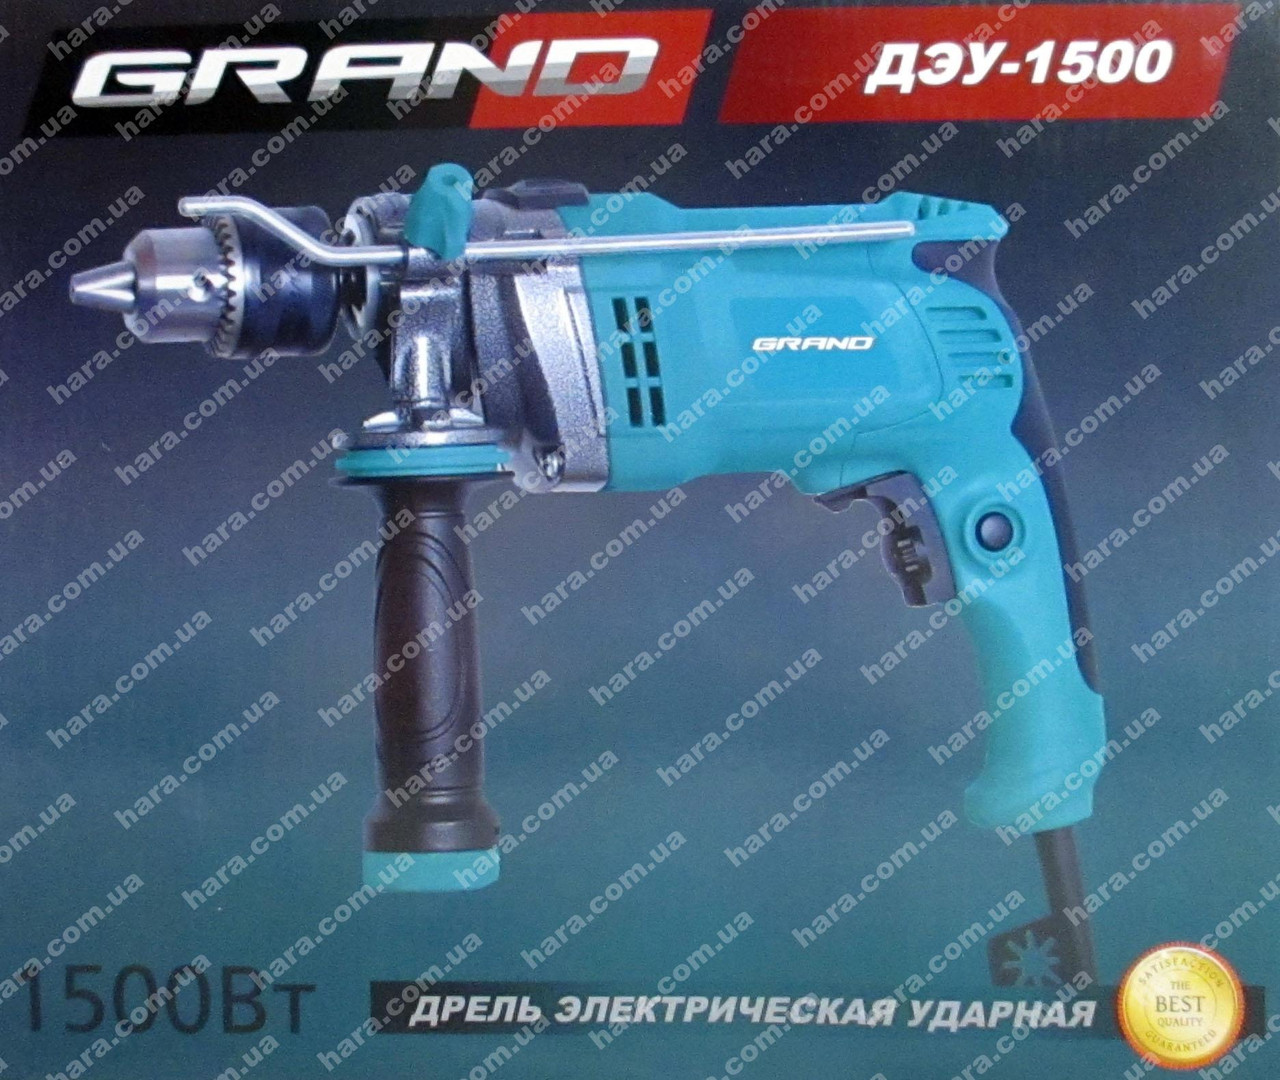 Дрель GRAND ДЭУ-1500